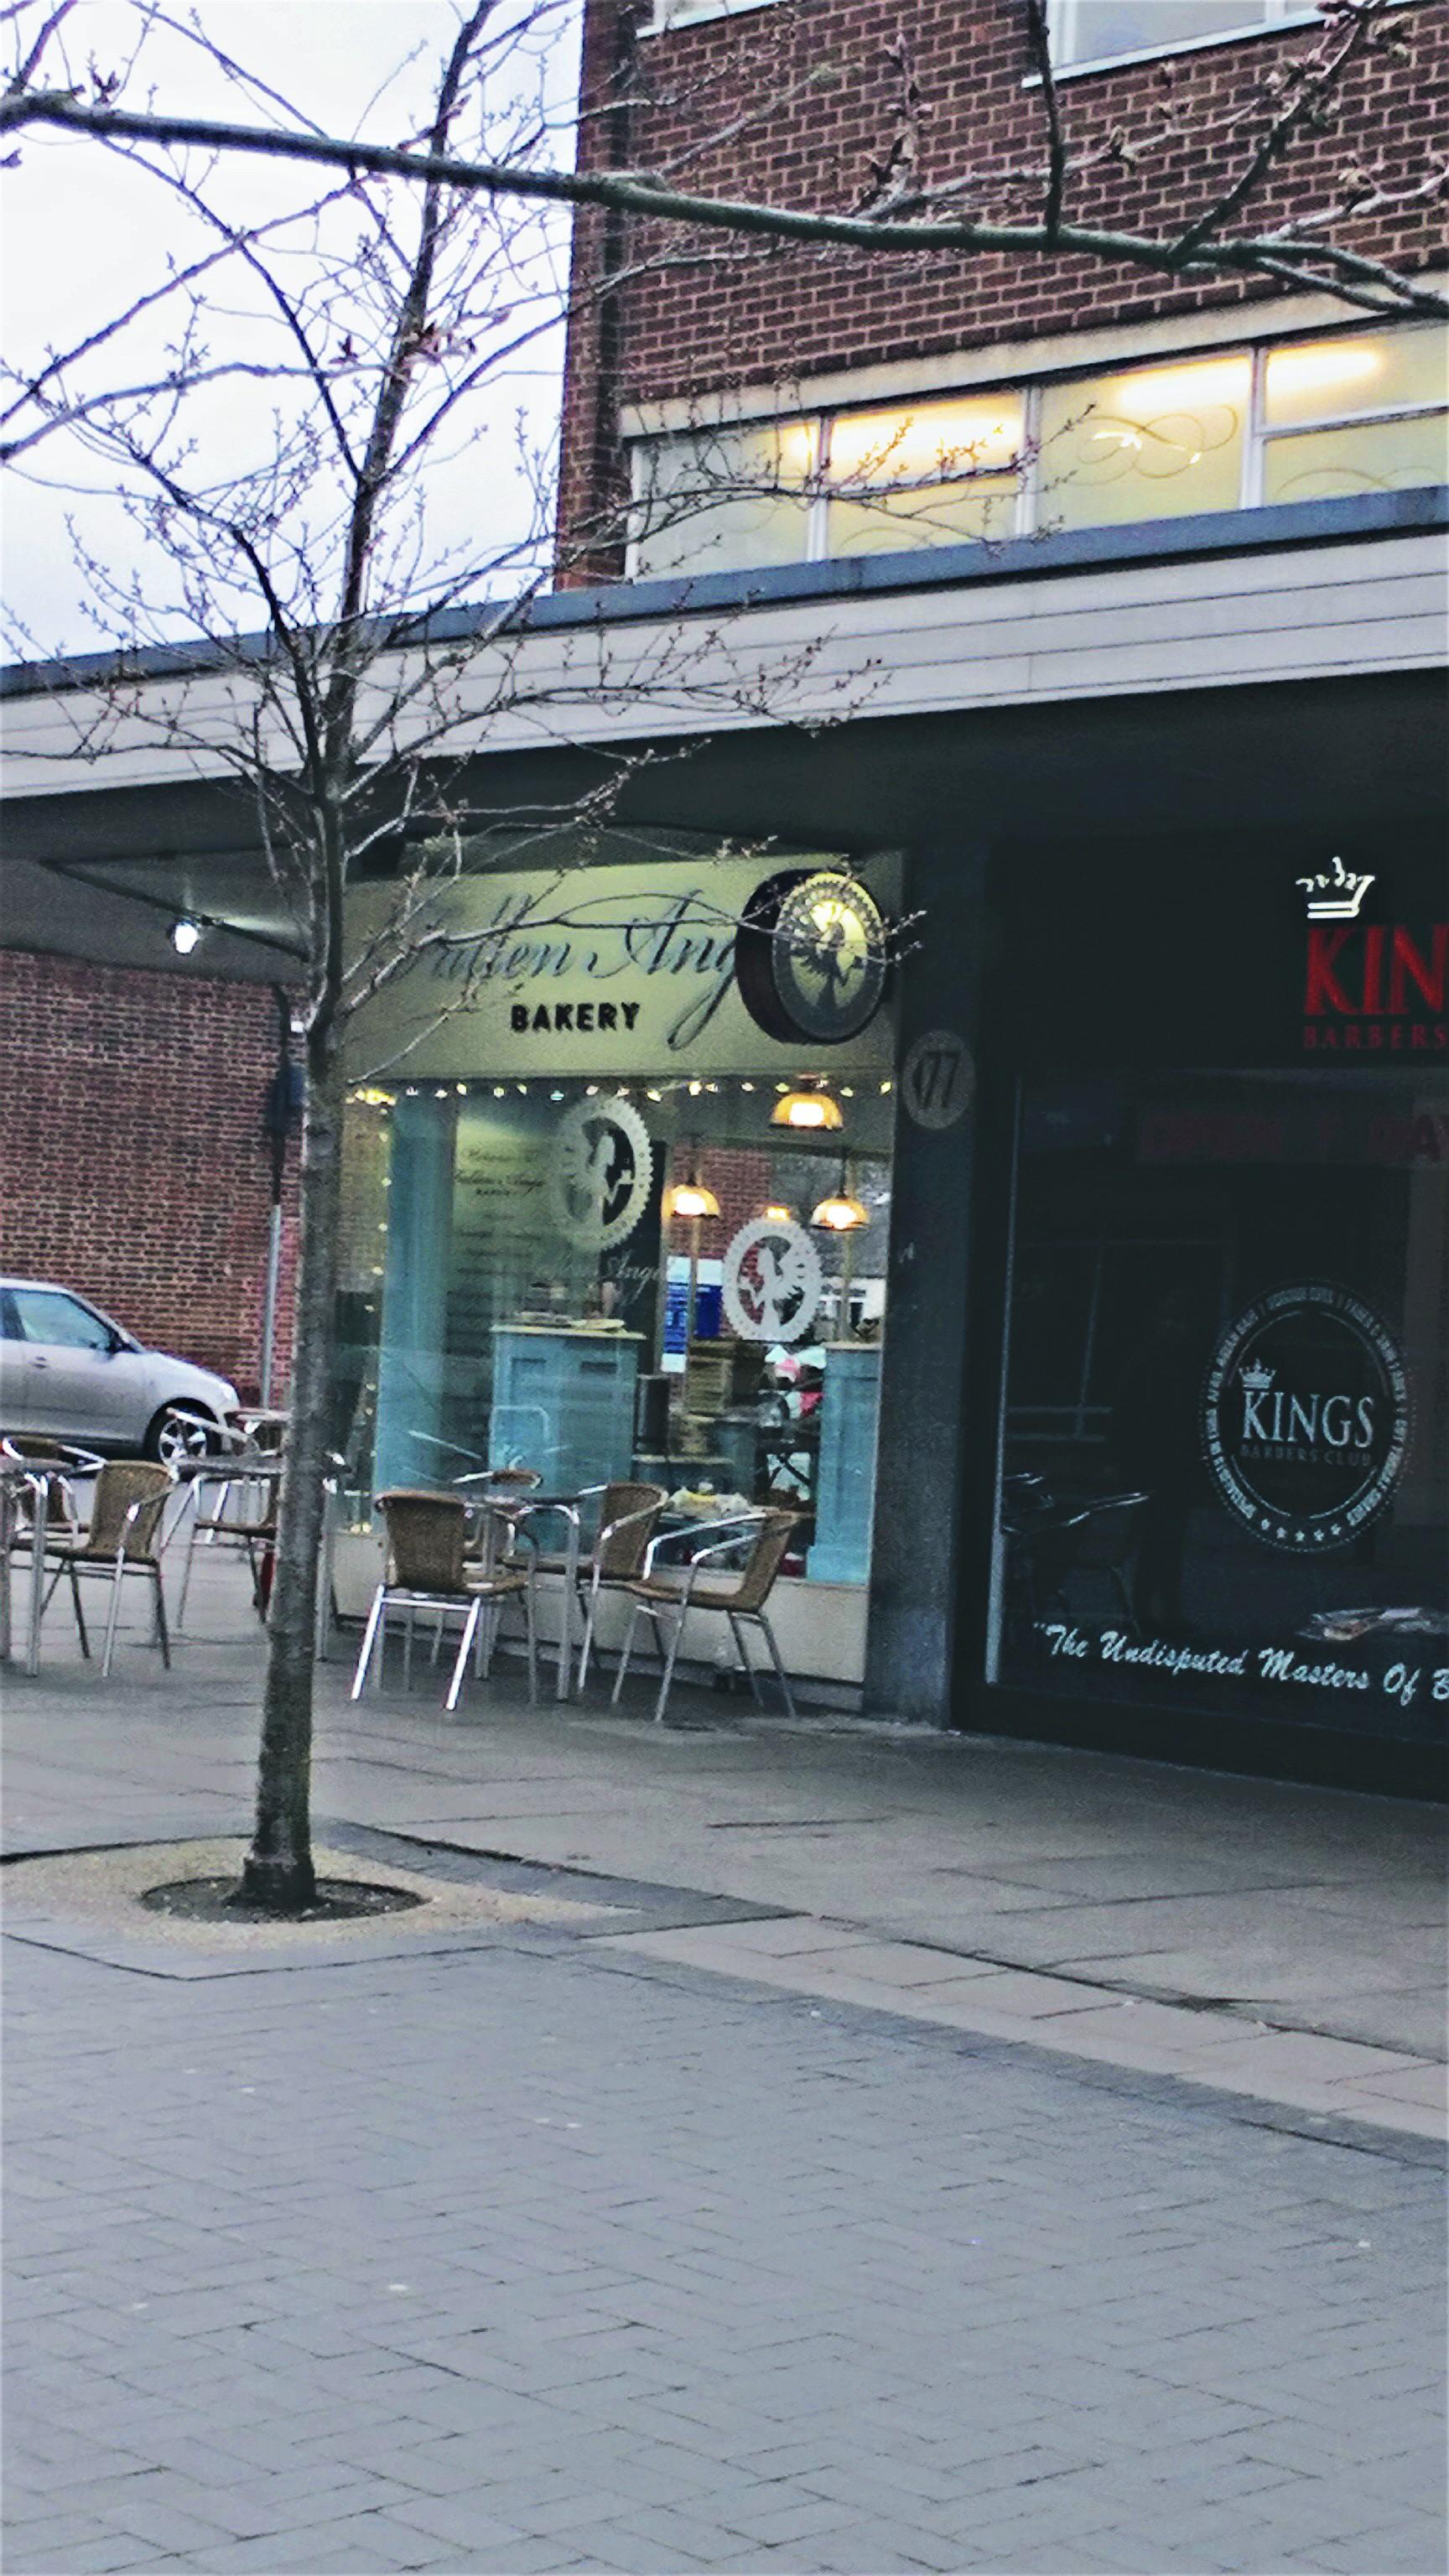 Pocket Number 1: The Fallen Angel Bakery, Harbone High Street